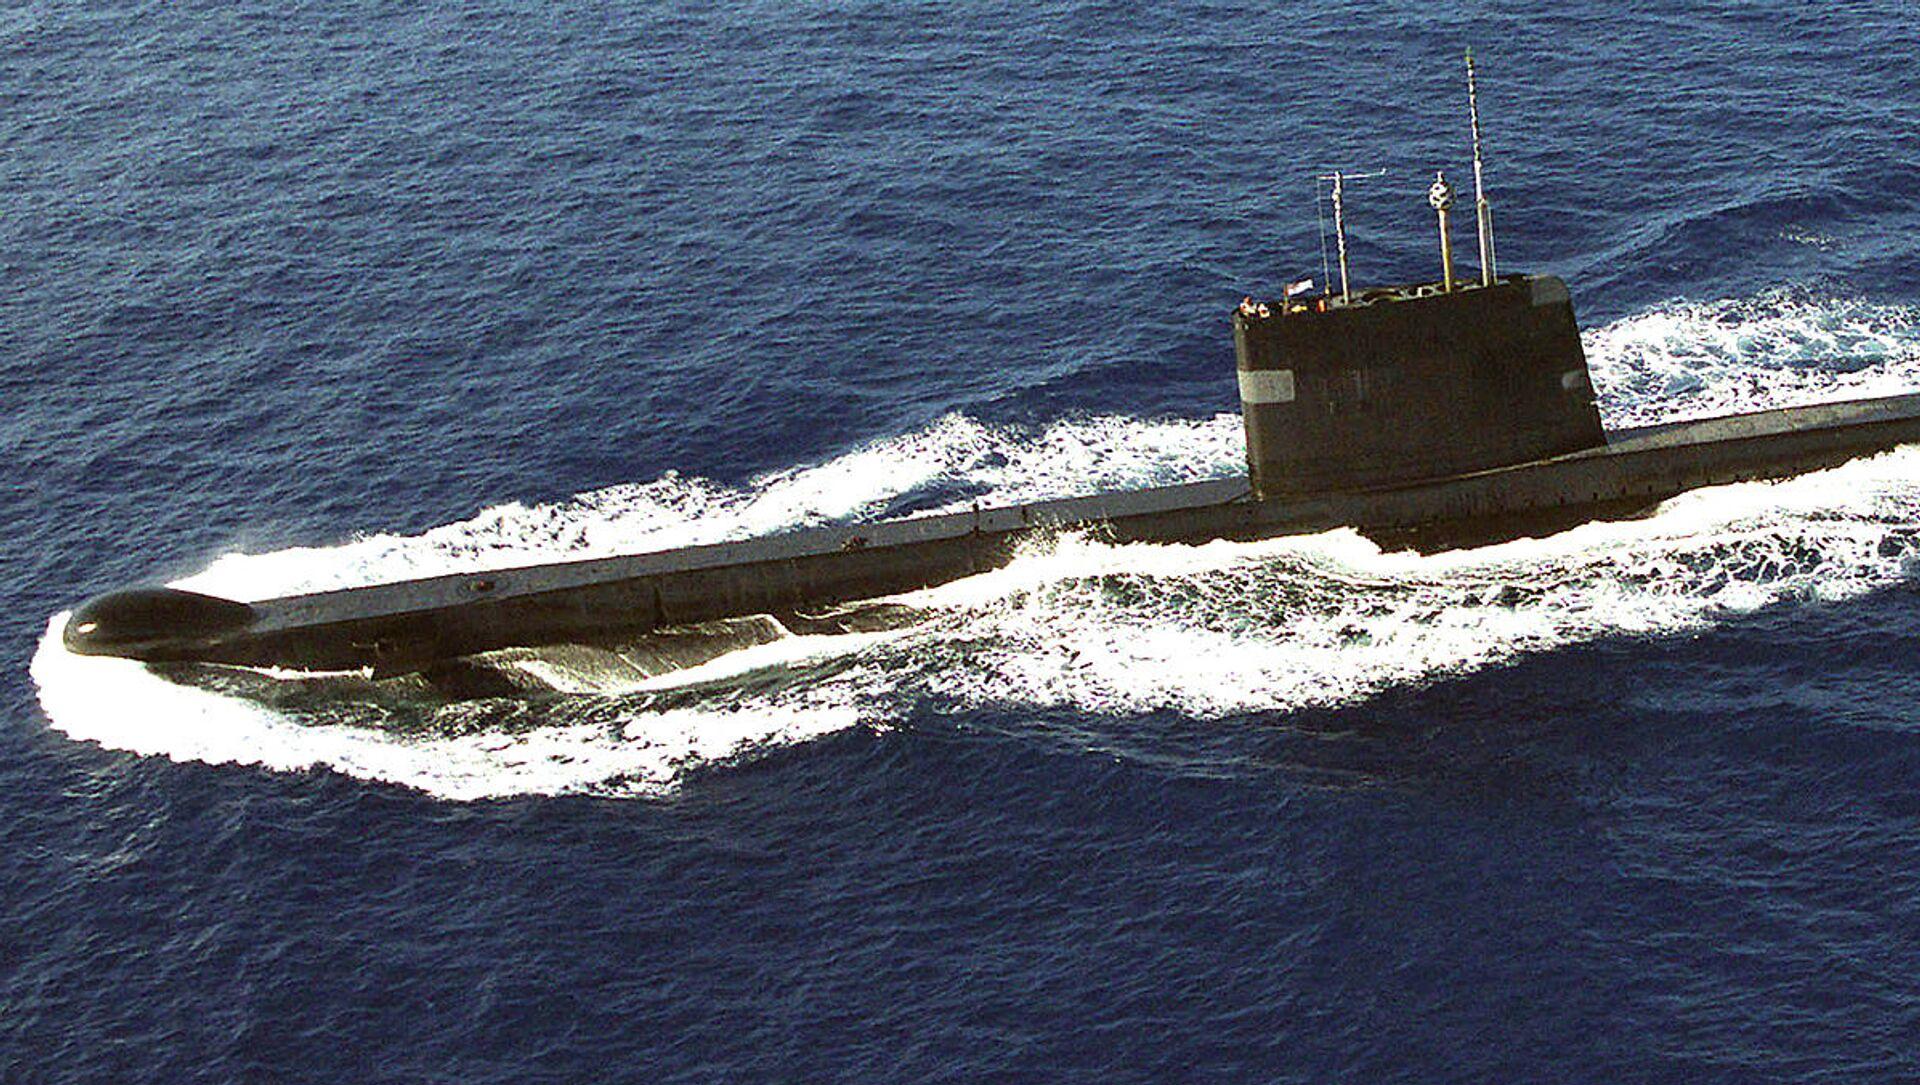 Tàu ngầm HMAS ONSLOW (SS-60) - Sputnik Việt Nam, 1920, 16.09.2021